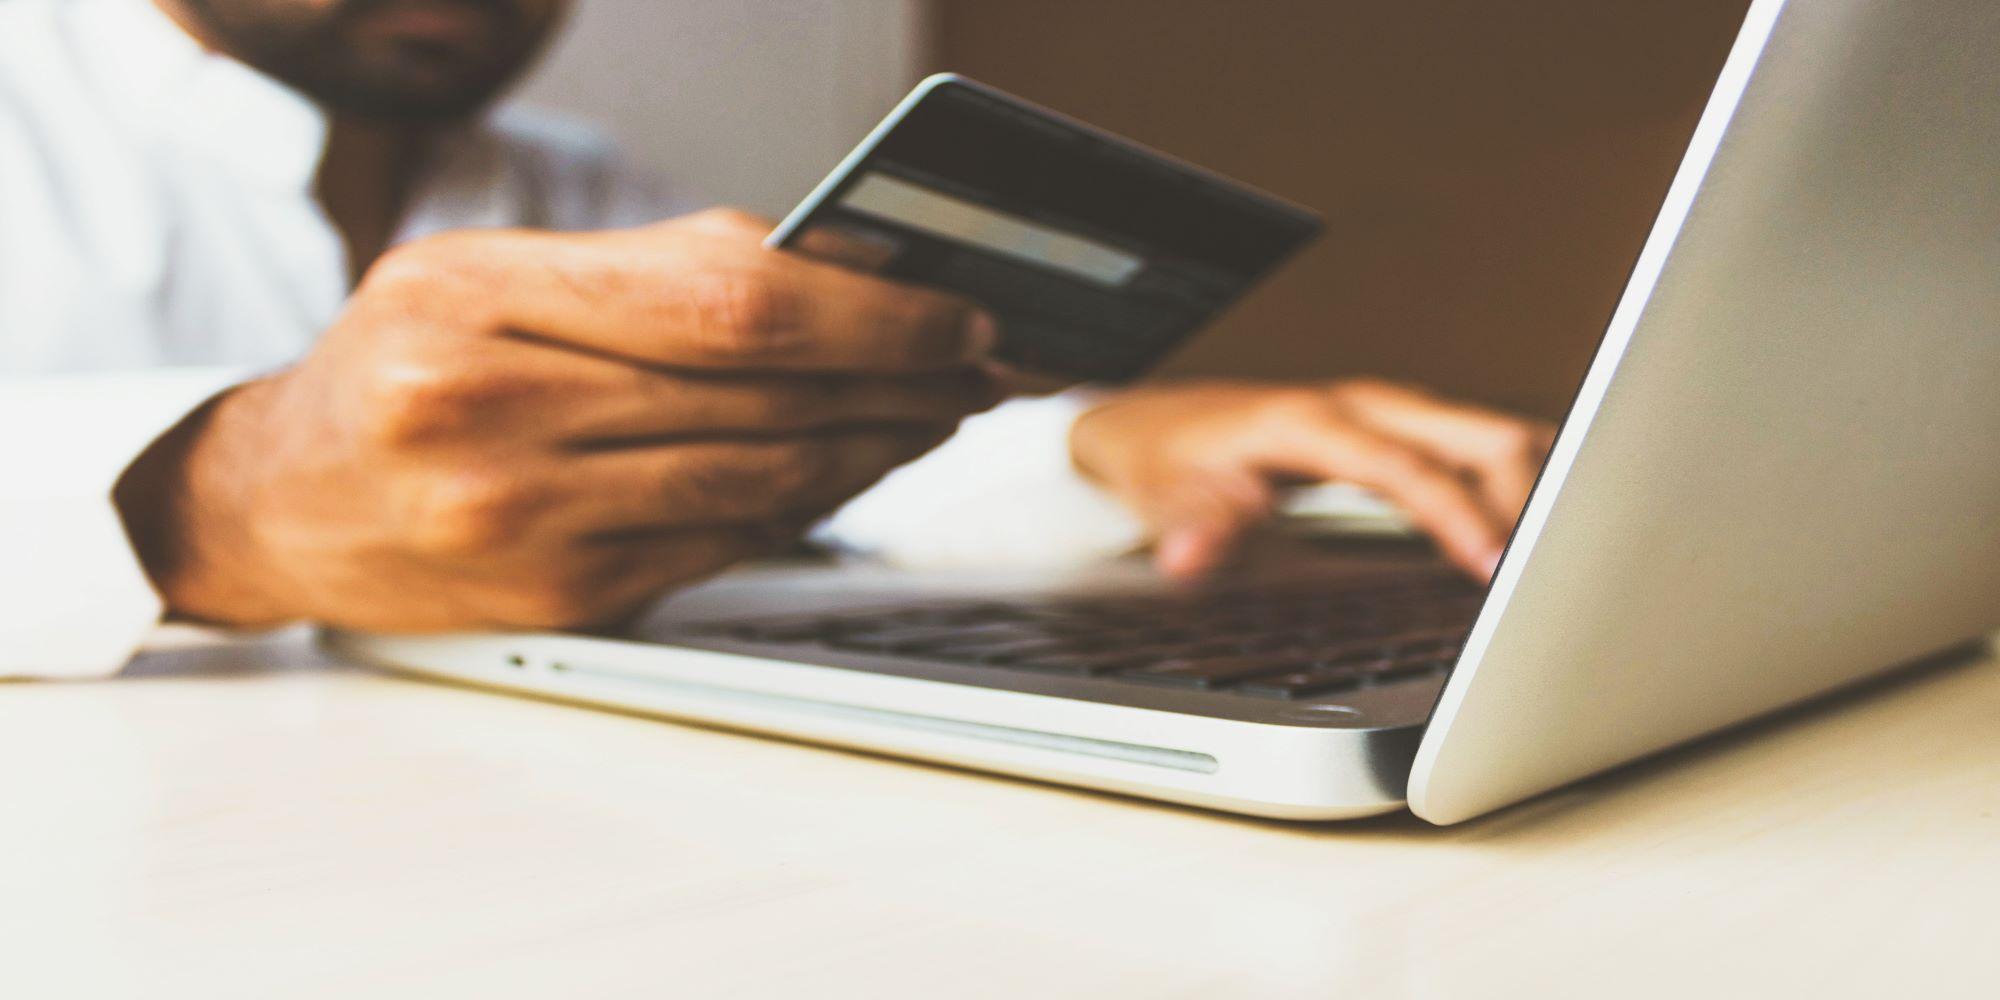 International Marketing News: COVID-19's Impact on eCommerce